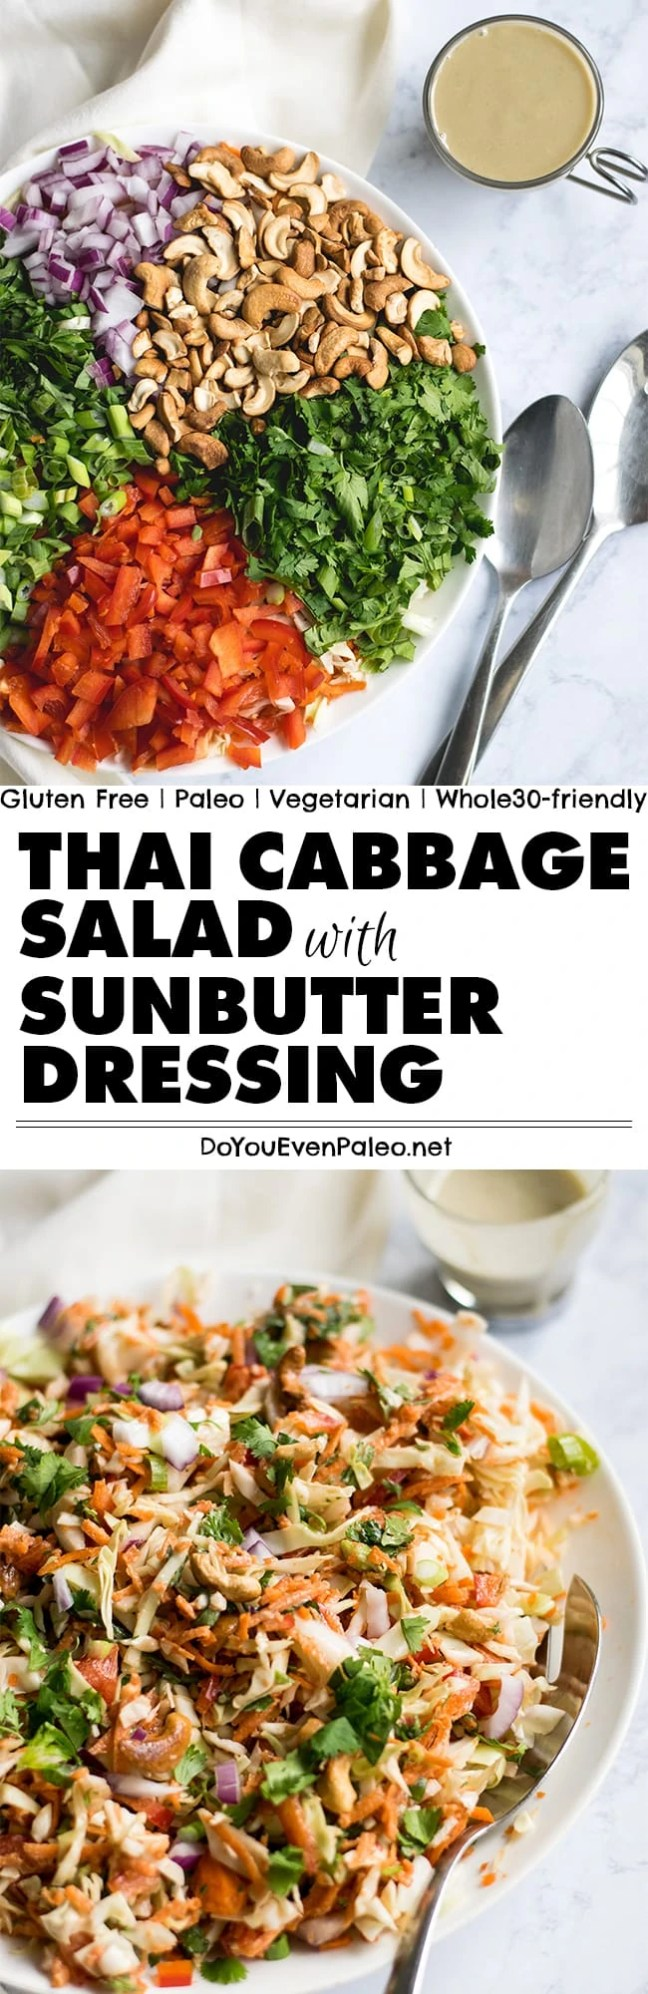 Crunchy, fresh, veggie-licious Thai Cabbage Salad with Sunbutter Dressing - paleo, gluten free, vegetarian, and Whole30-friendly!   DoYouEvenPaleo.net